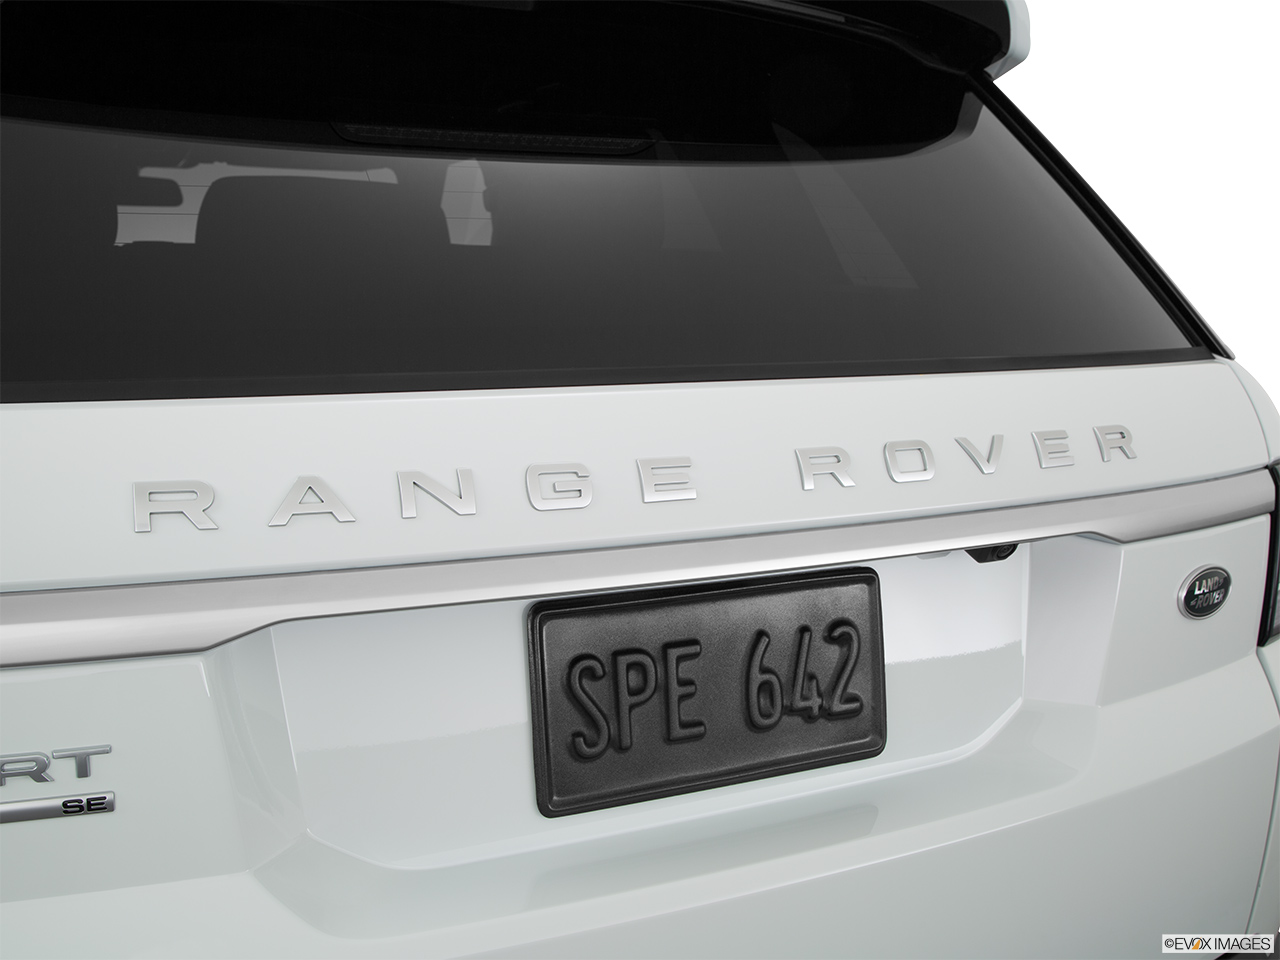 2015 Land Rover Range Rover Sport 4wd 4 Door Se Rear